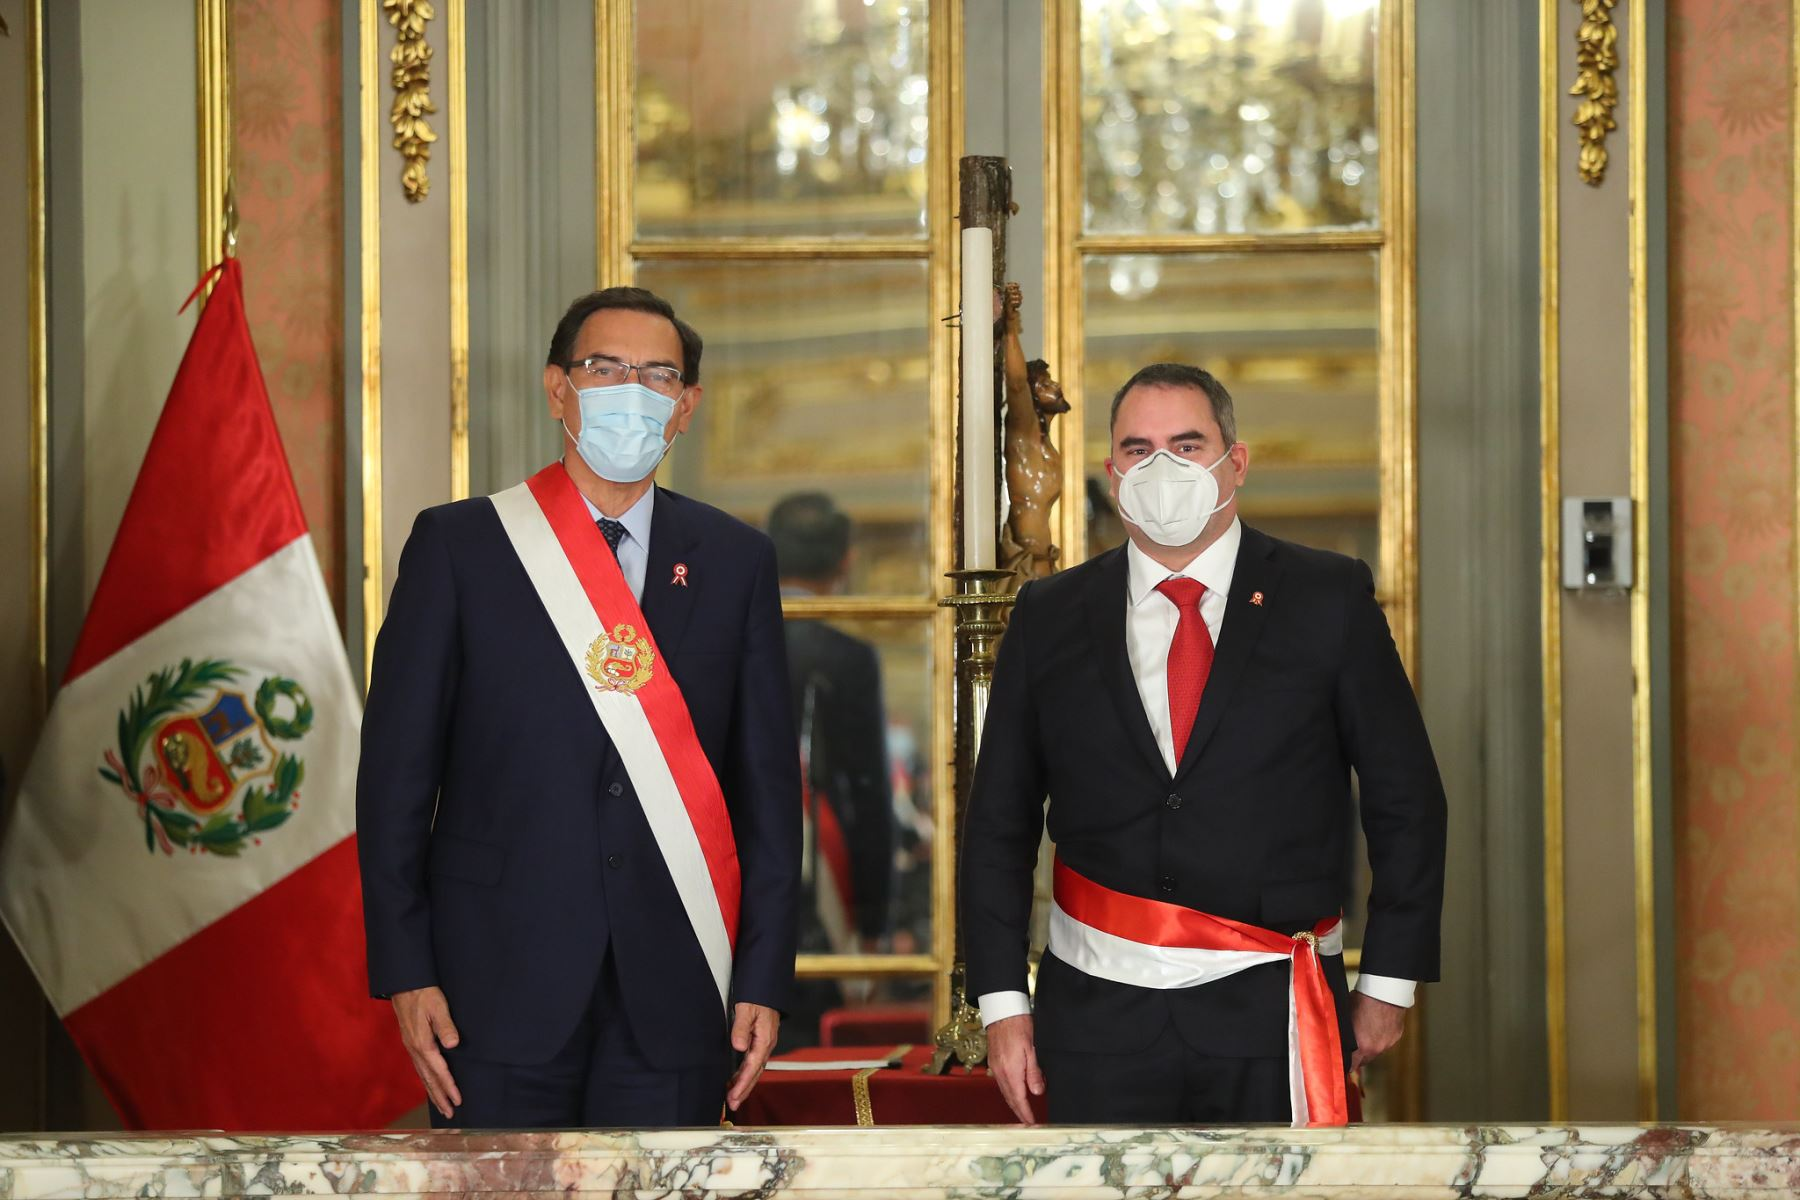 Presidente Martín Vizcarra tomo juramento de Rafael Belaunde Llosa como ministro de Energía y Minas. Foto: ANDINA/Prensa Presidencia